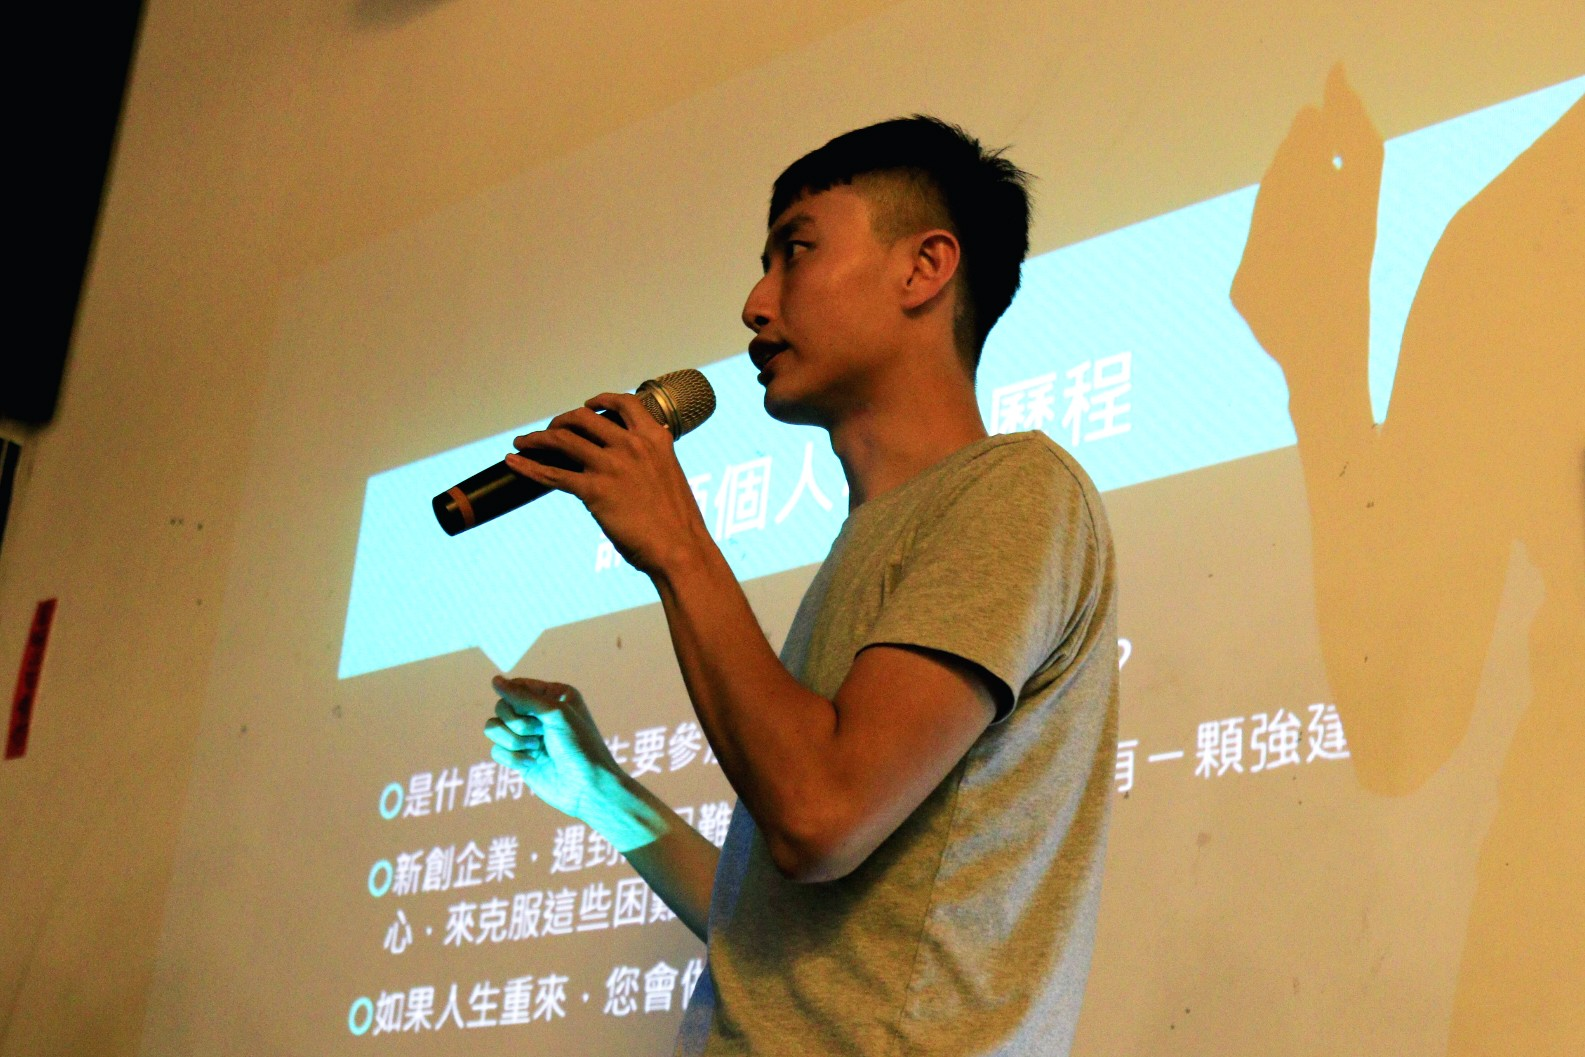 BAR41重新設計職涯選擇:東南亞移工與社會創業